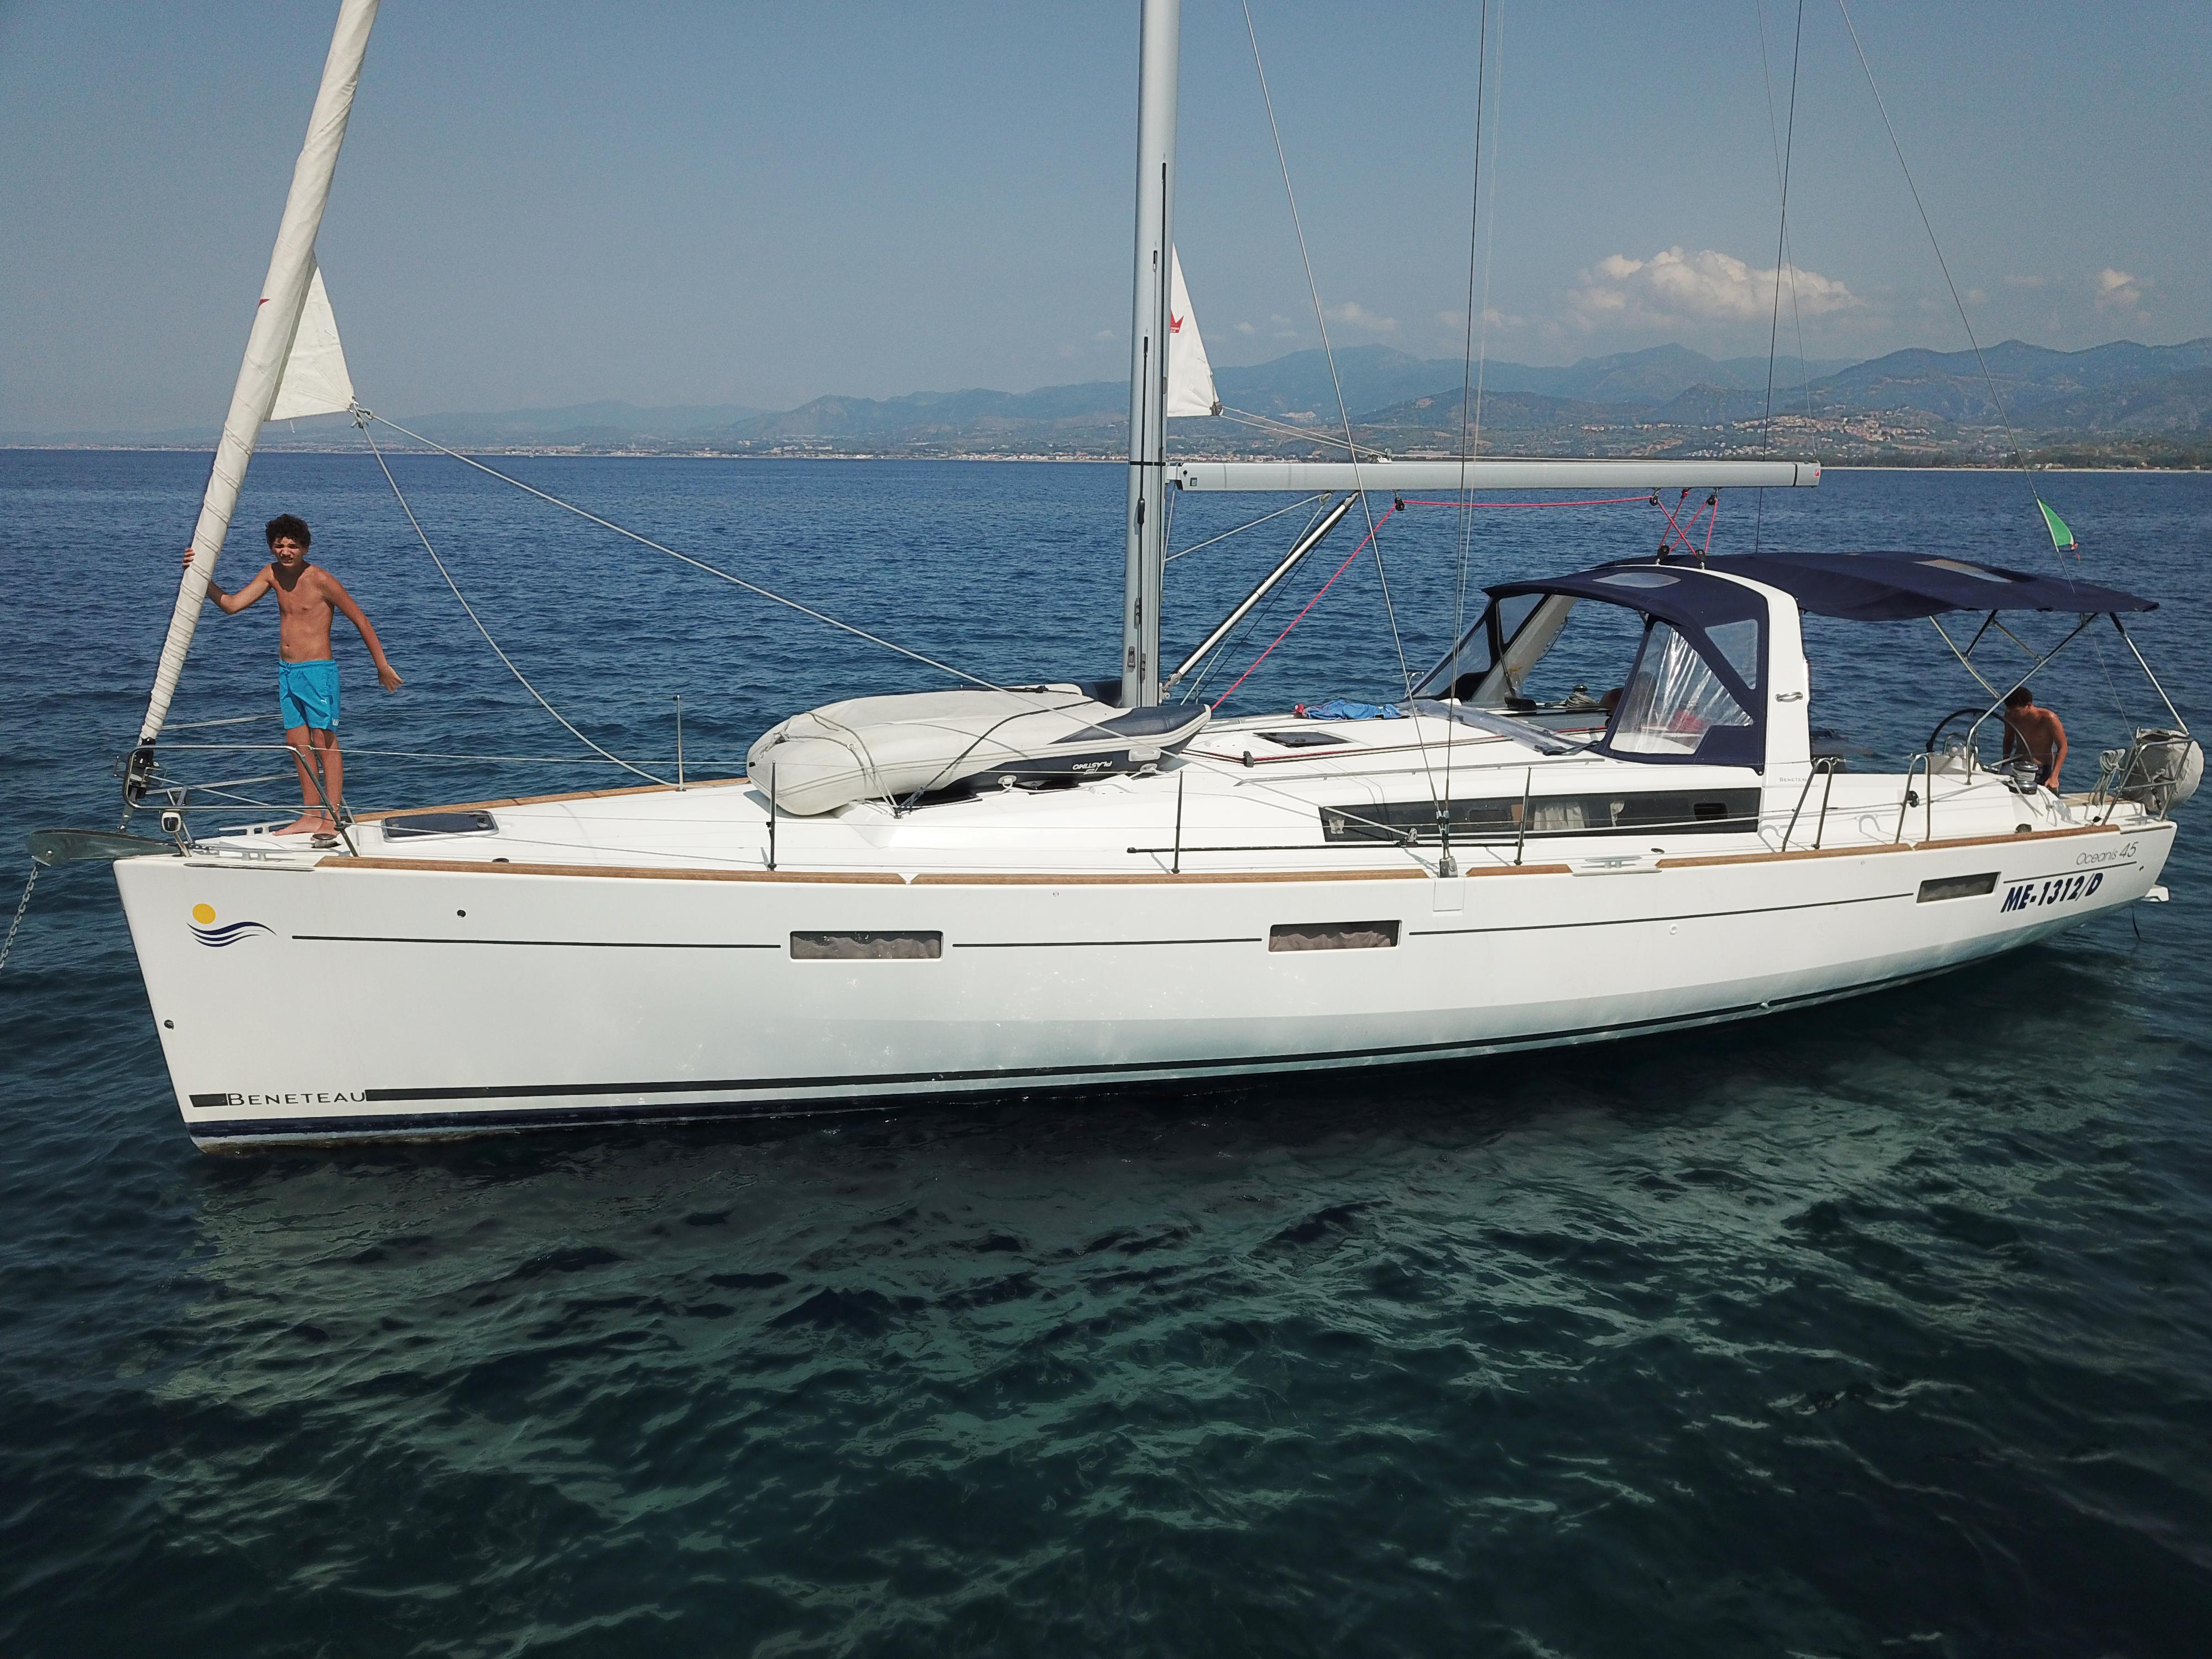 Oceanis 45 in navigazione